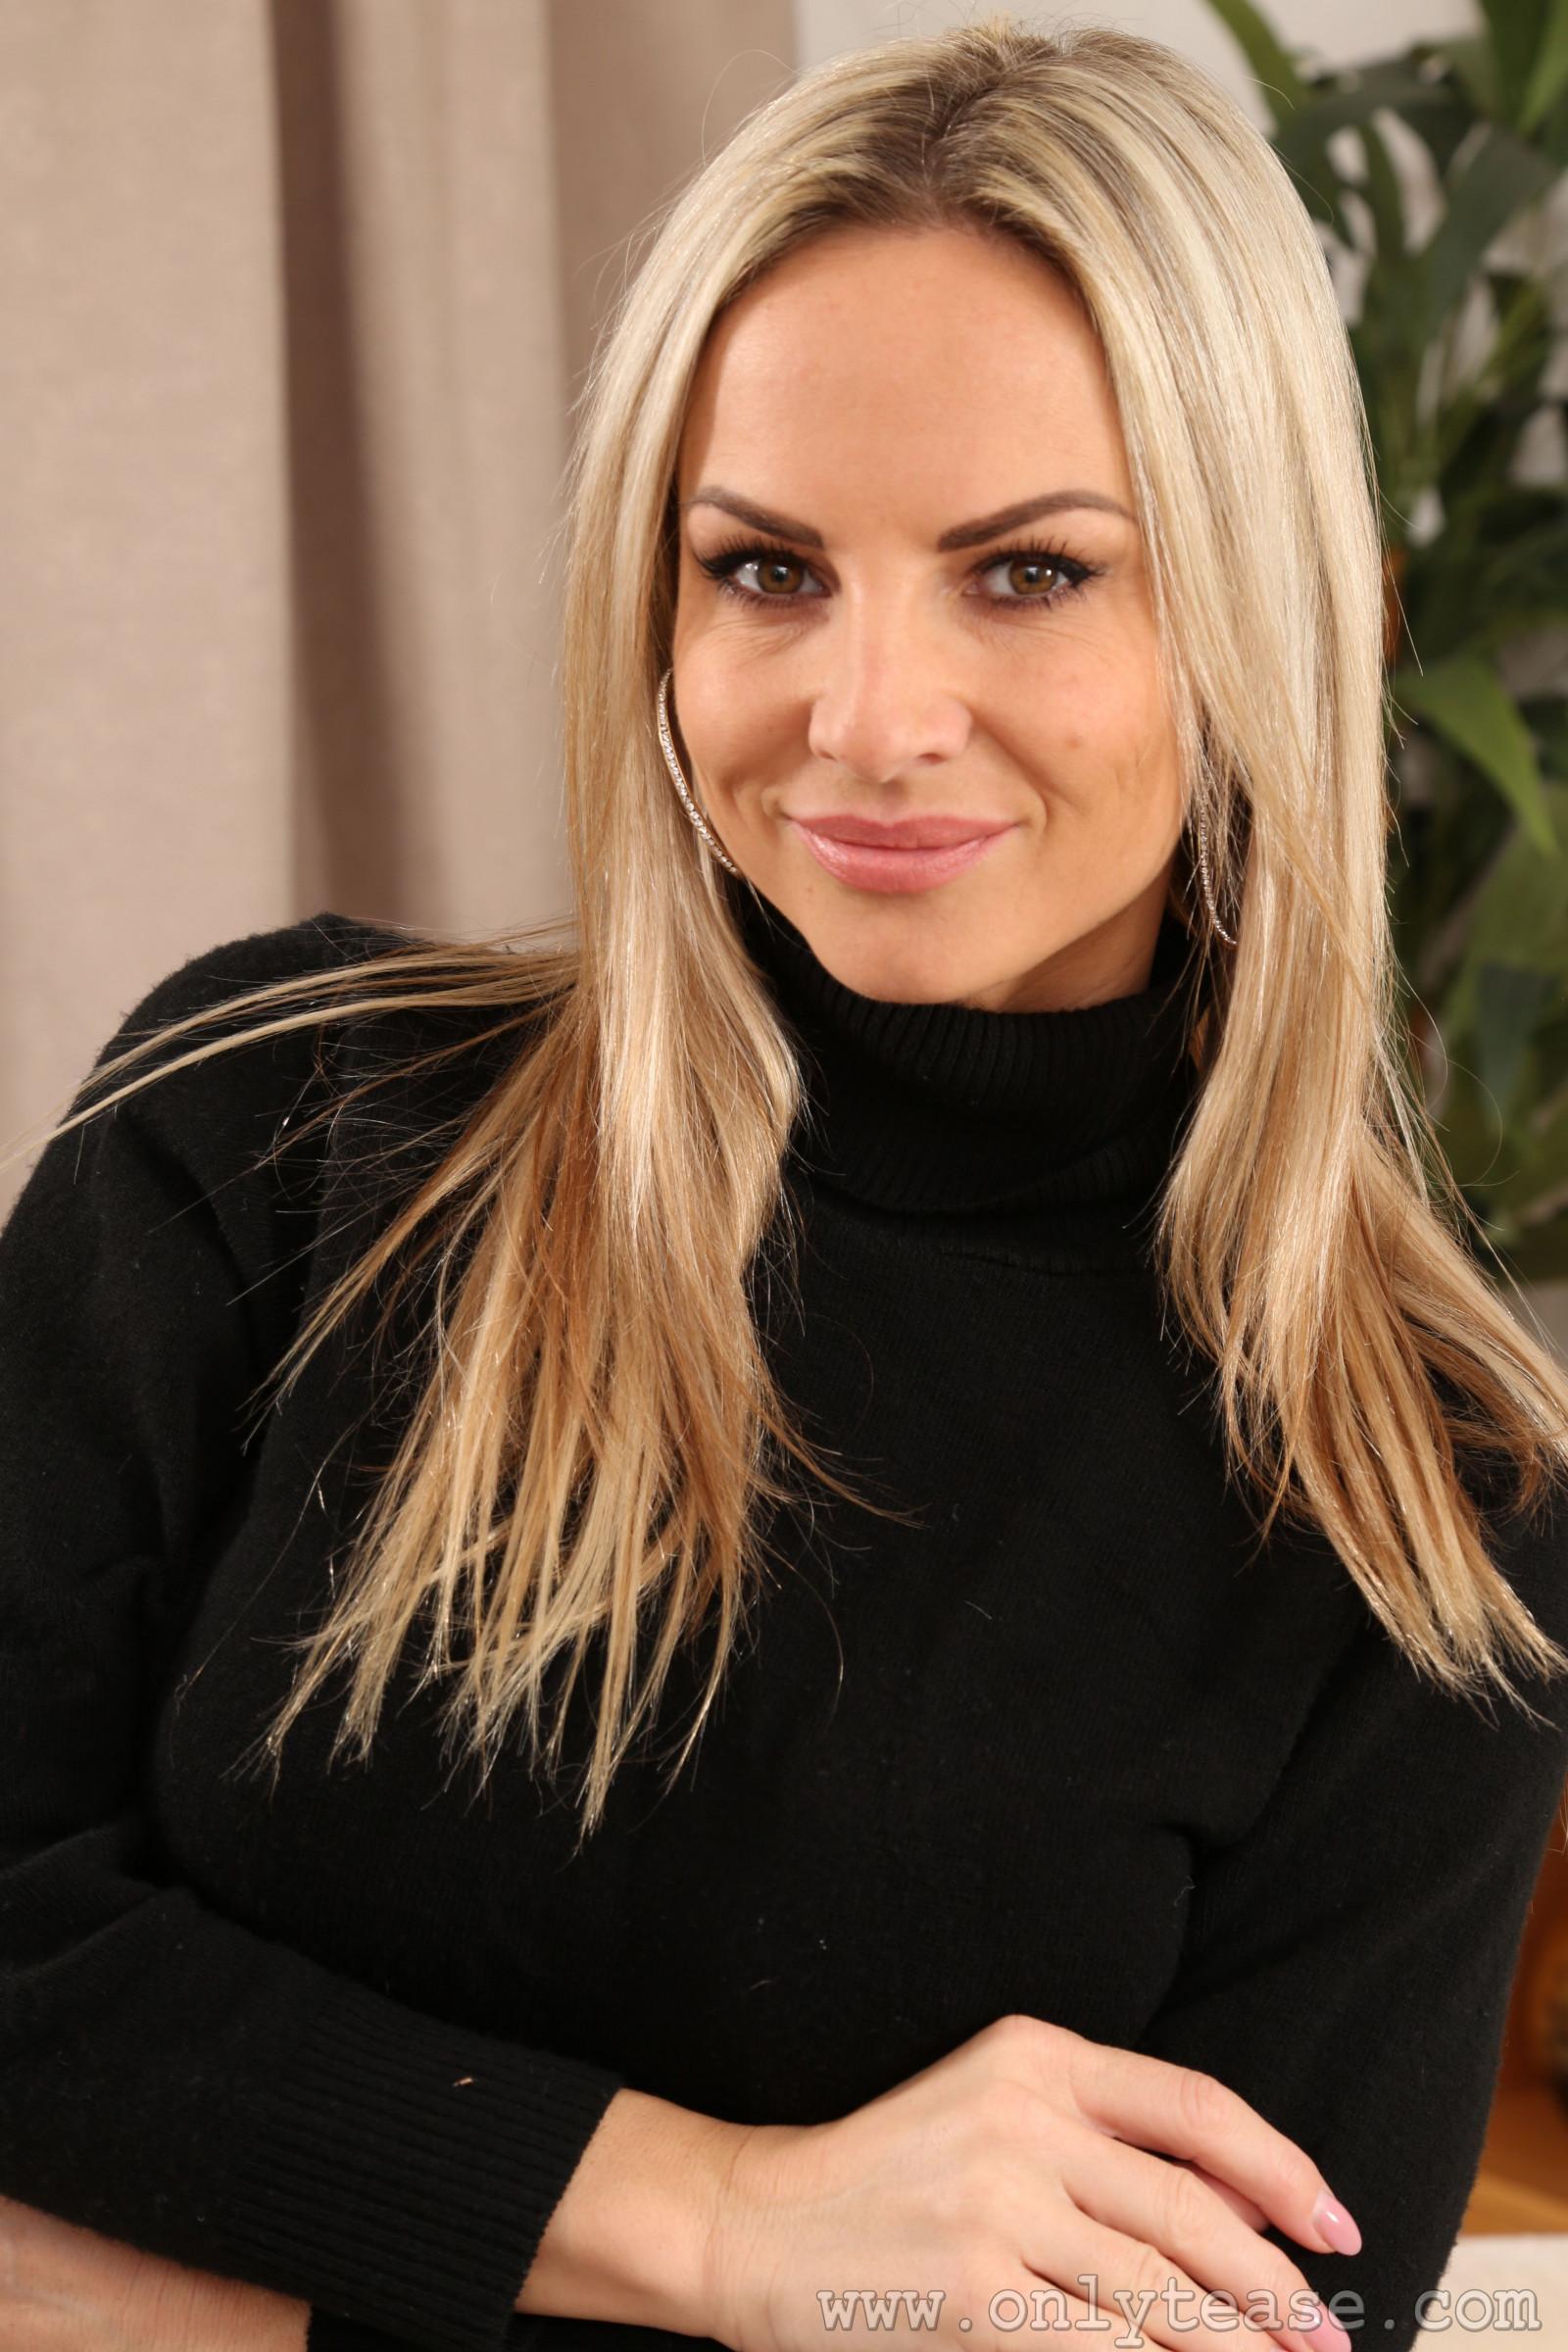 Fondos de pantalla : Vendula Bednarova, rubia 3744x5616